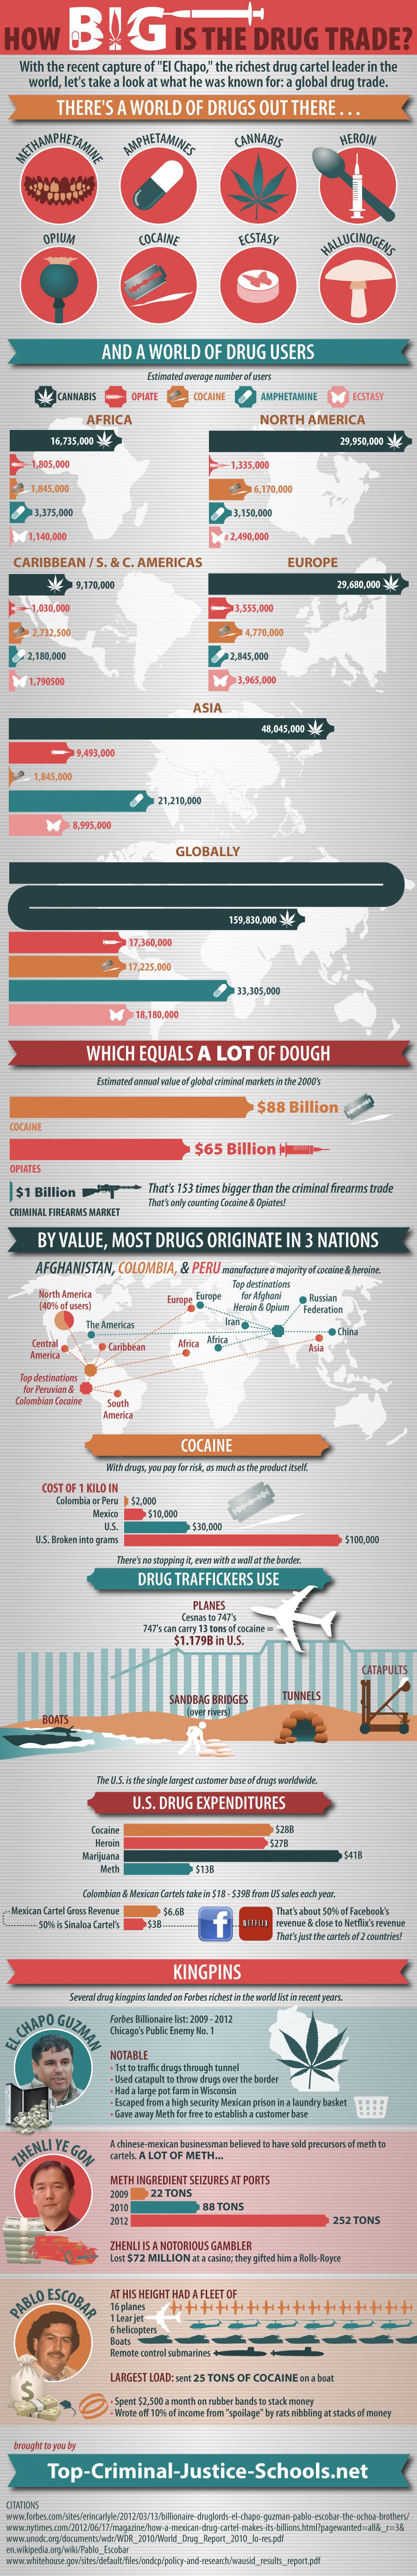 How-big-is-drug-trade